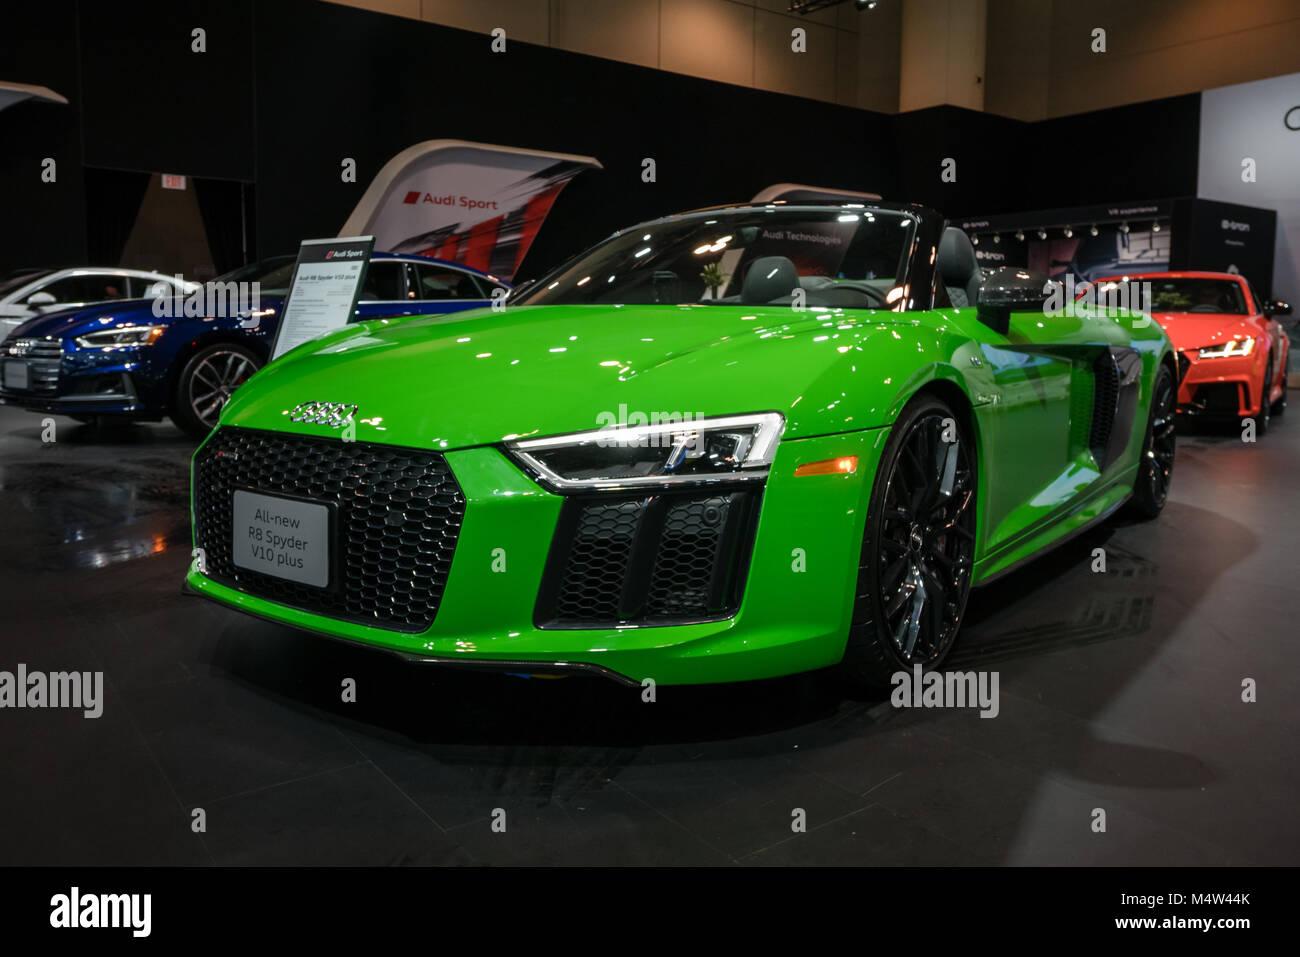 Audi R8 Spyder Stock Photos Amp Audi R8 Spyder Stock Images